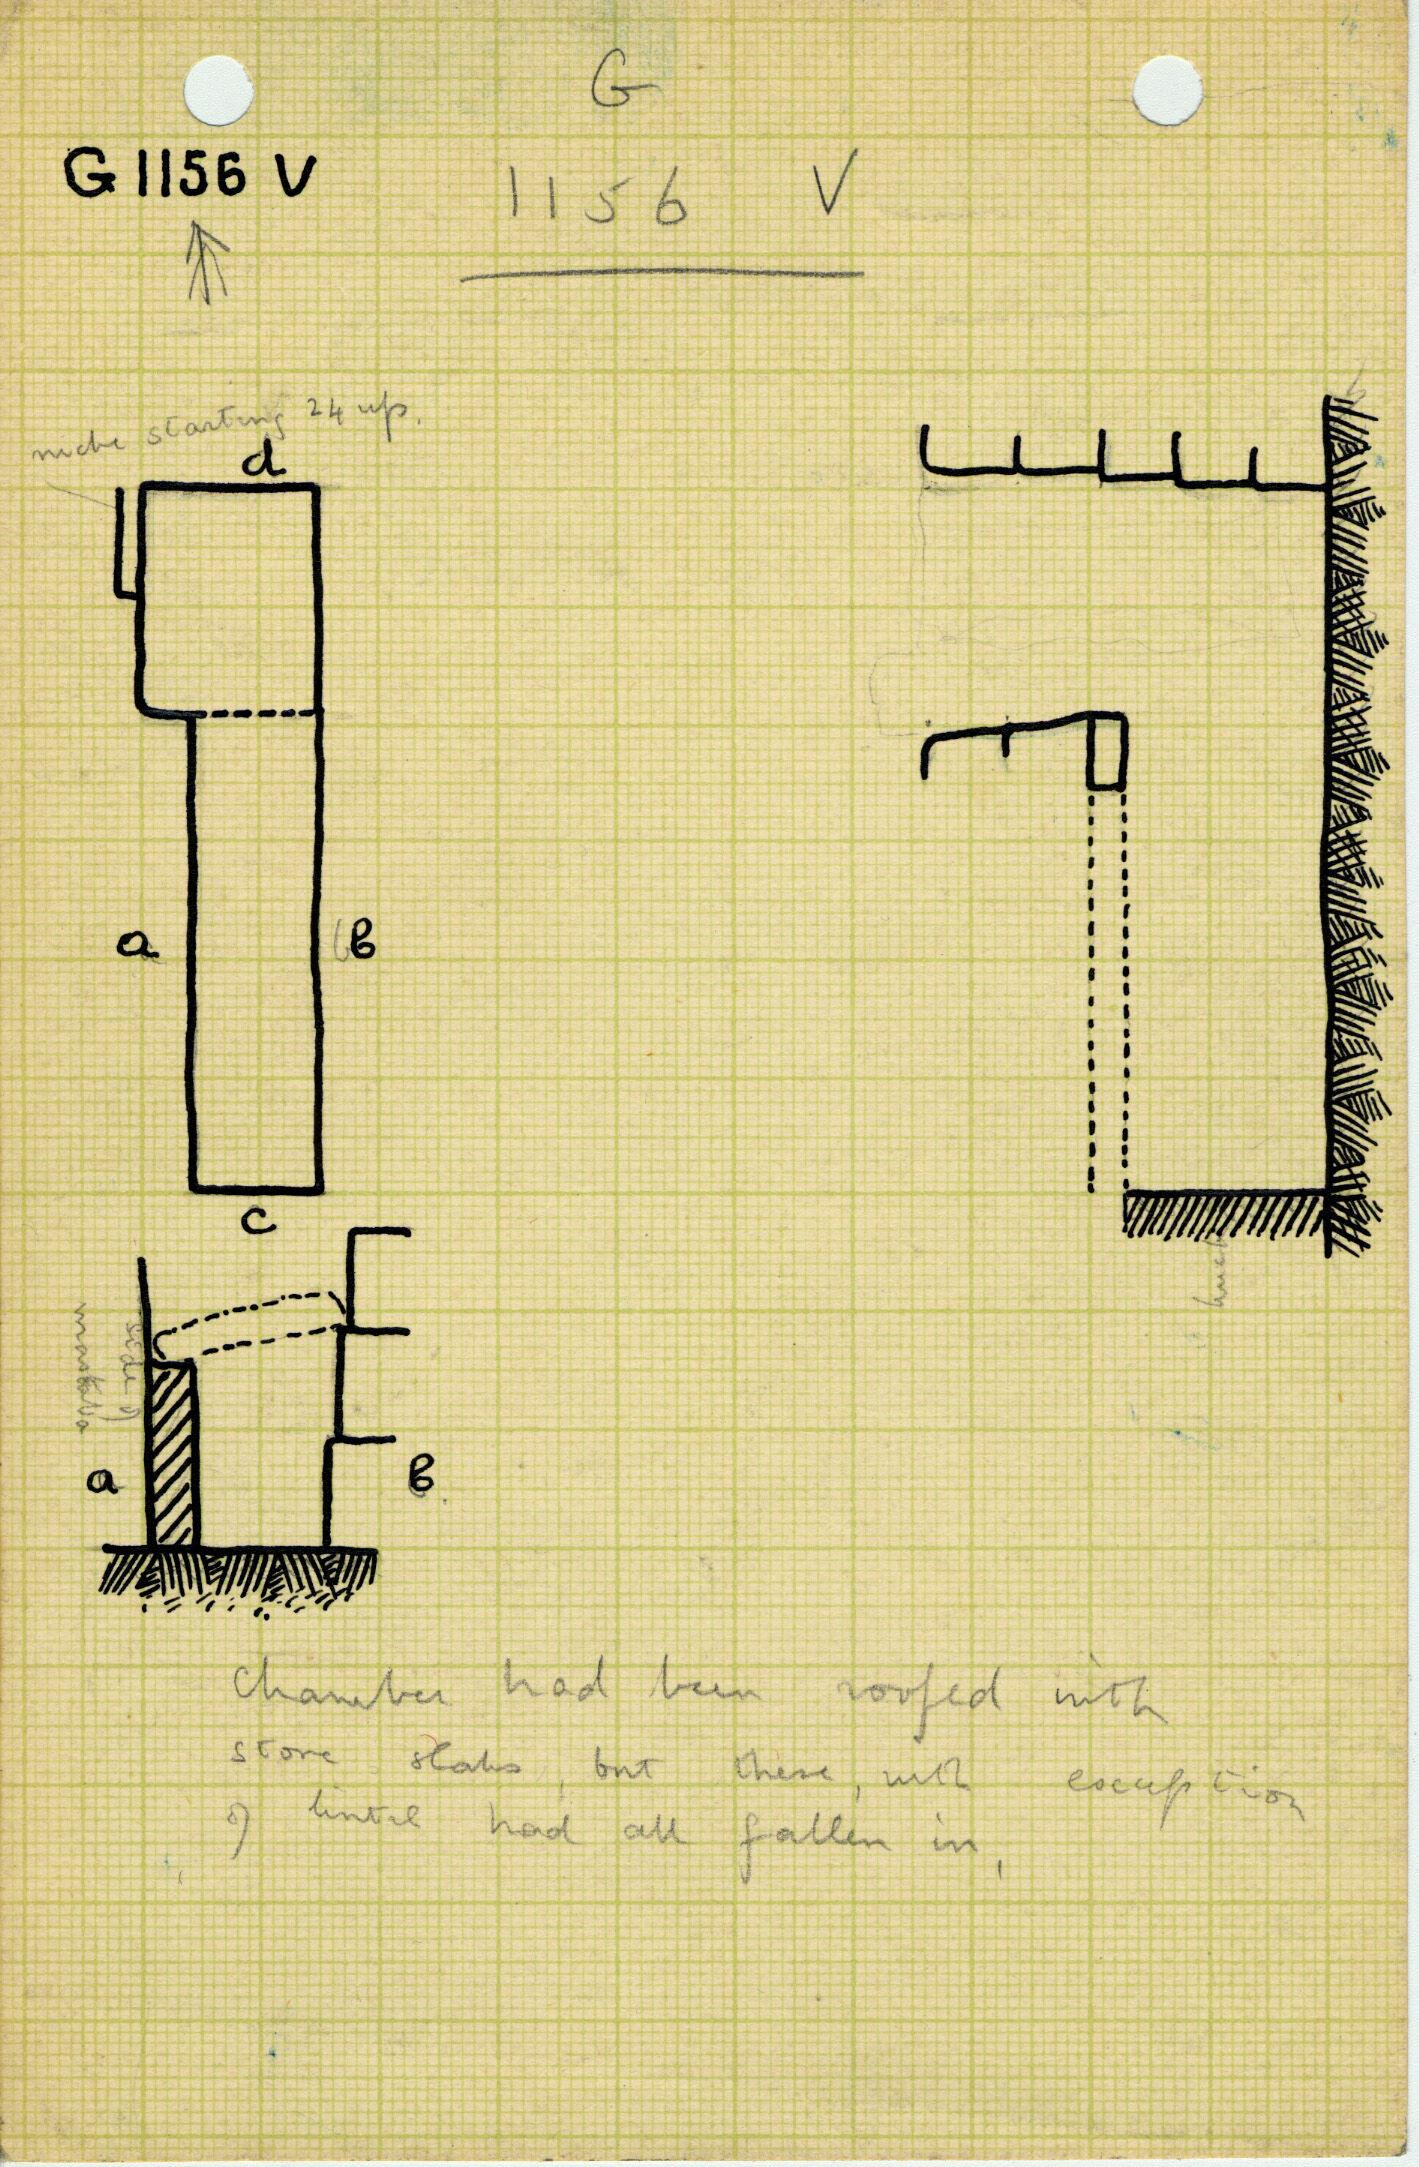 Maps and plans: G 1156, Shaft V